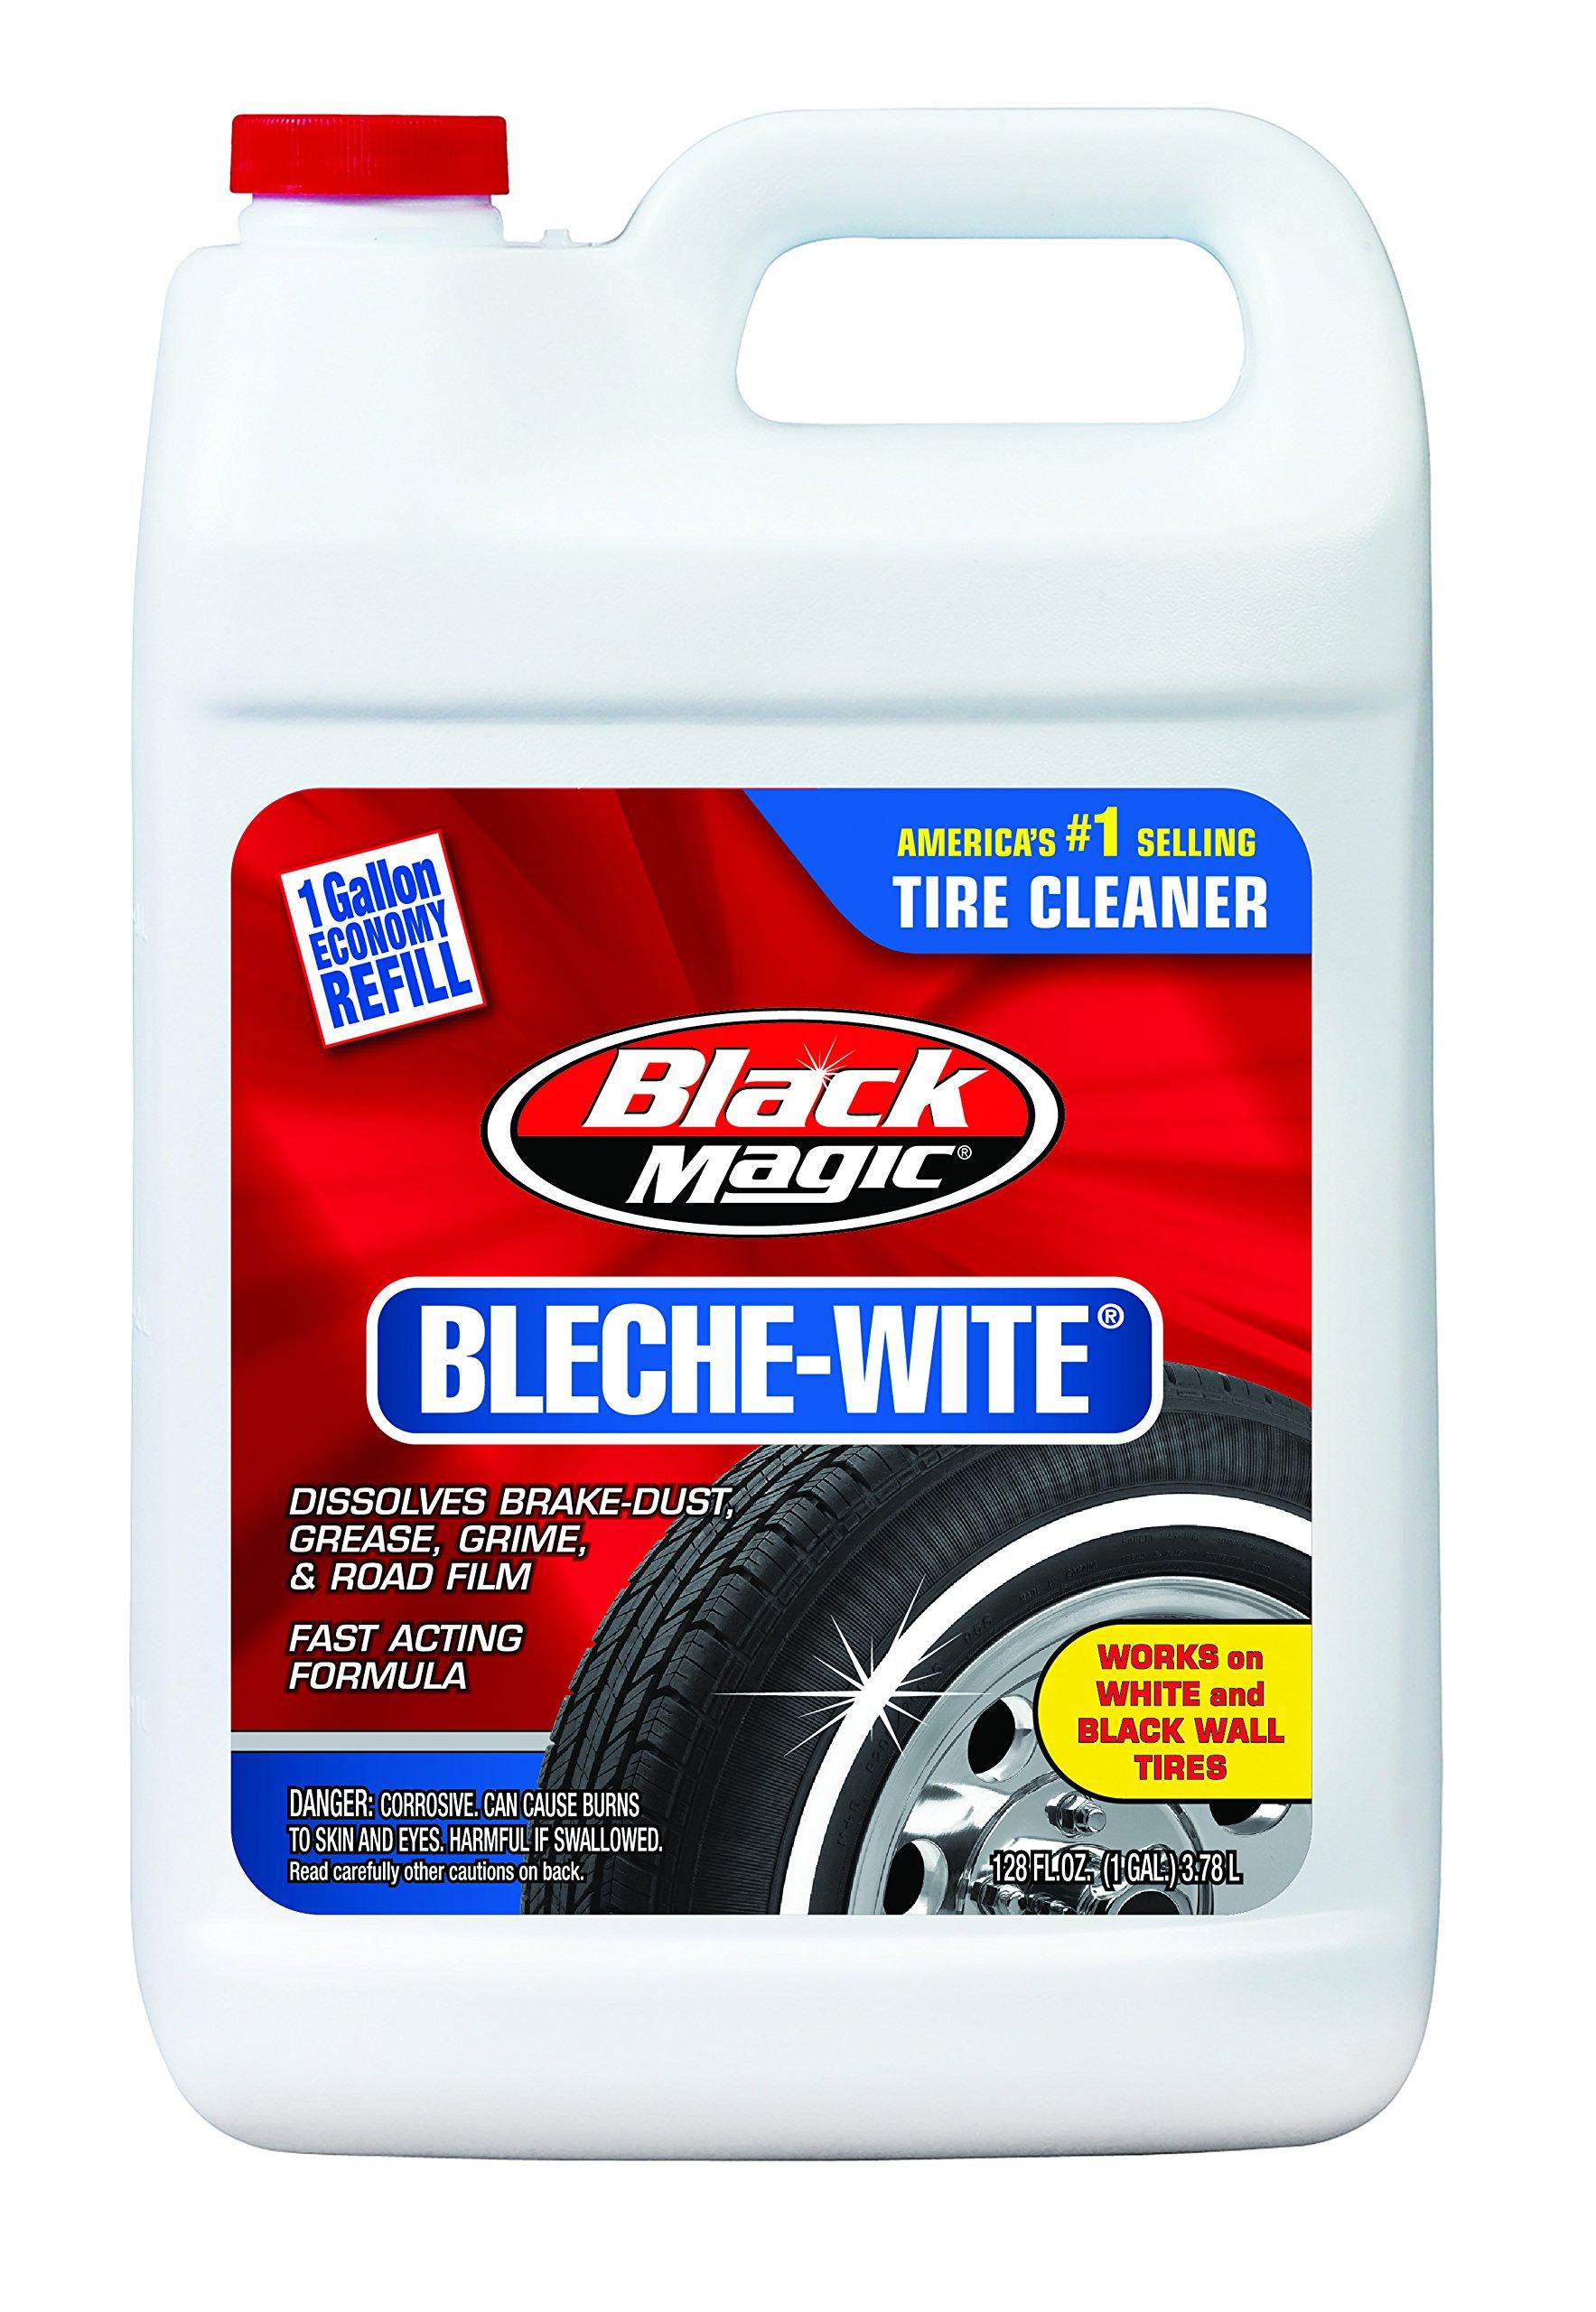 Black Magic 800002222-6PK Bleche-Wite Tire Cleaner, 1 Gallon (Pack of 6)